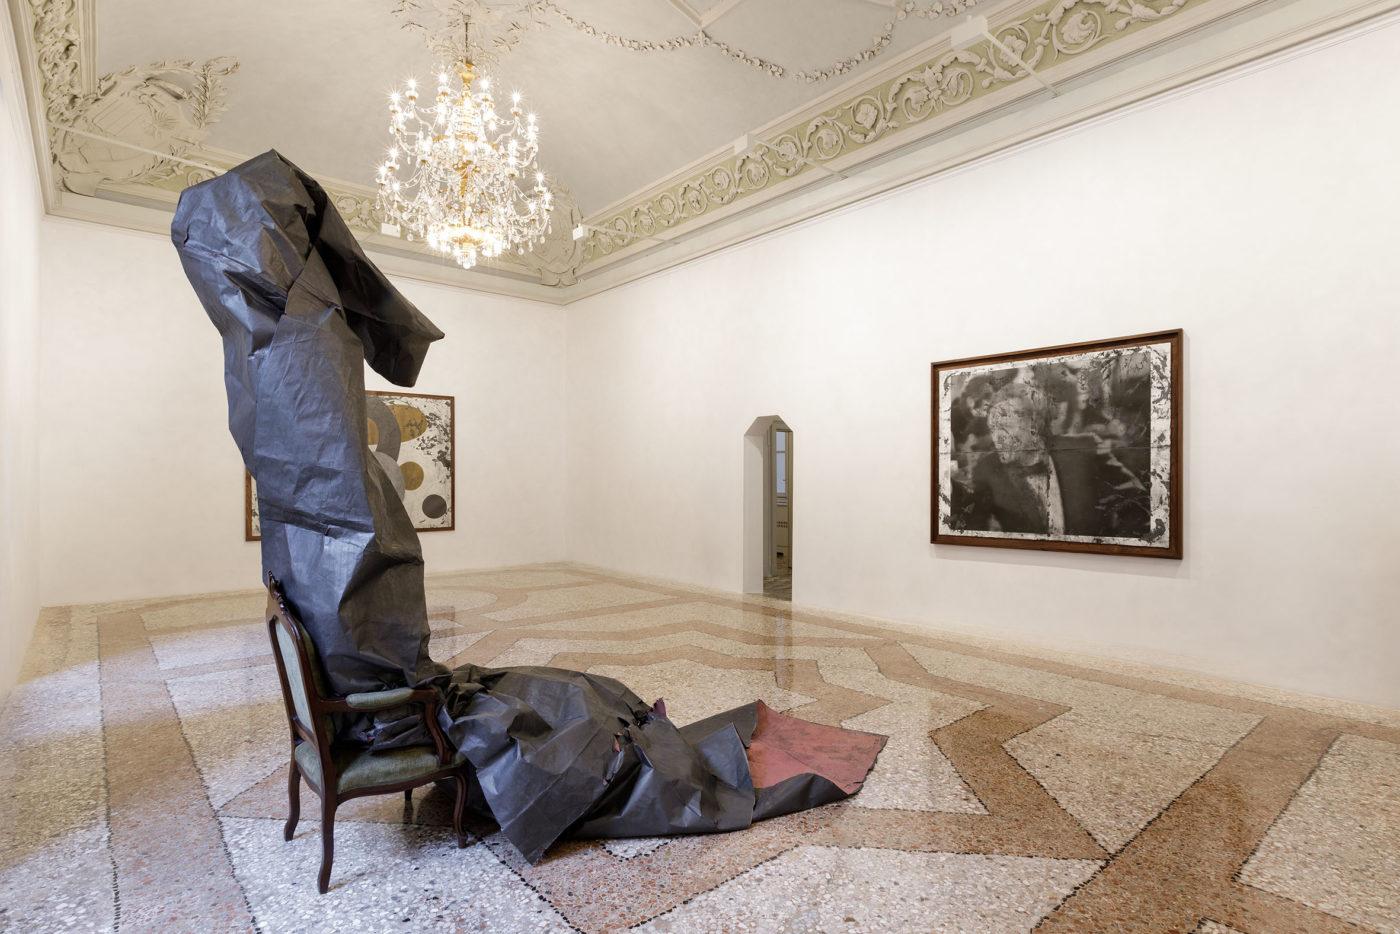 Tony Lewis - The danders (as far as i can see), Galleria Massimo De Carlo, Milano